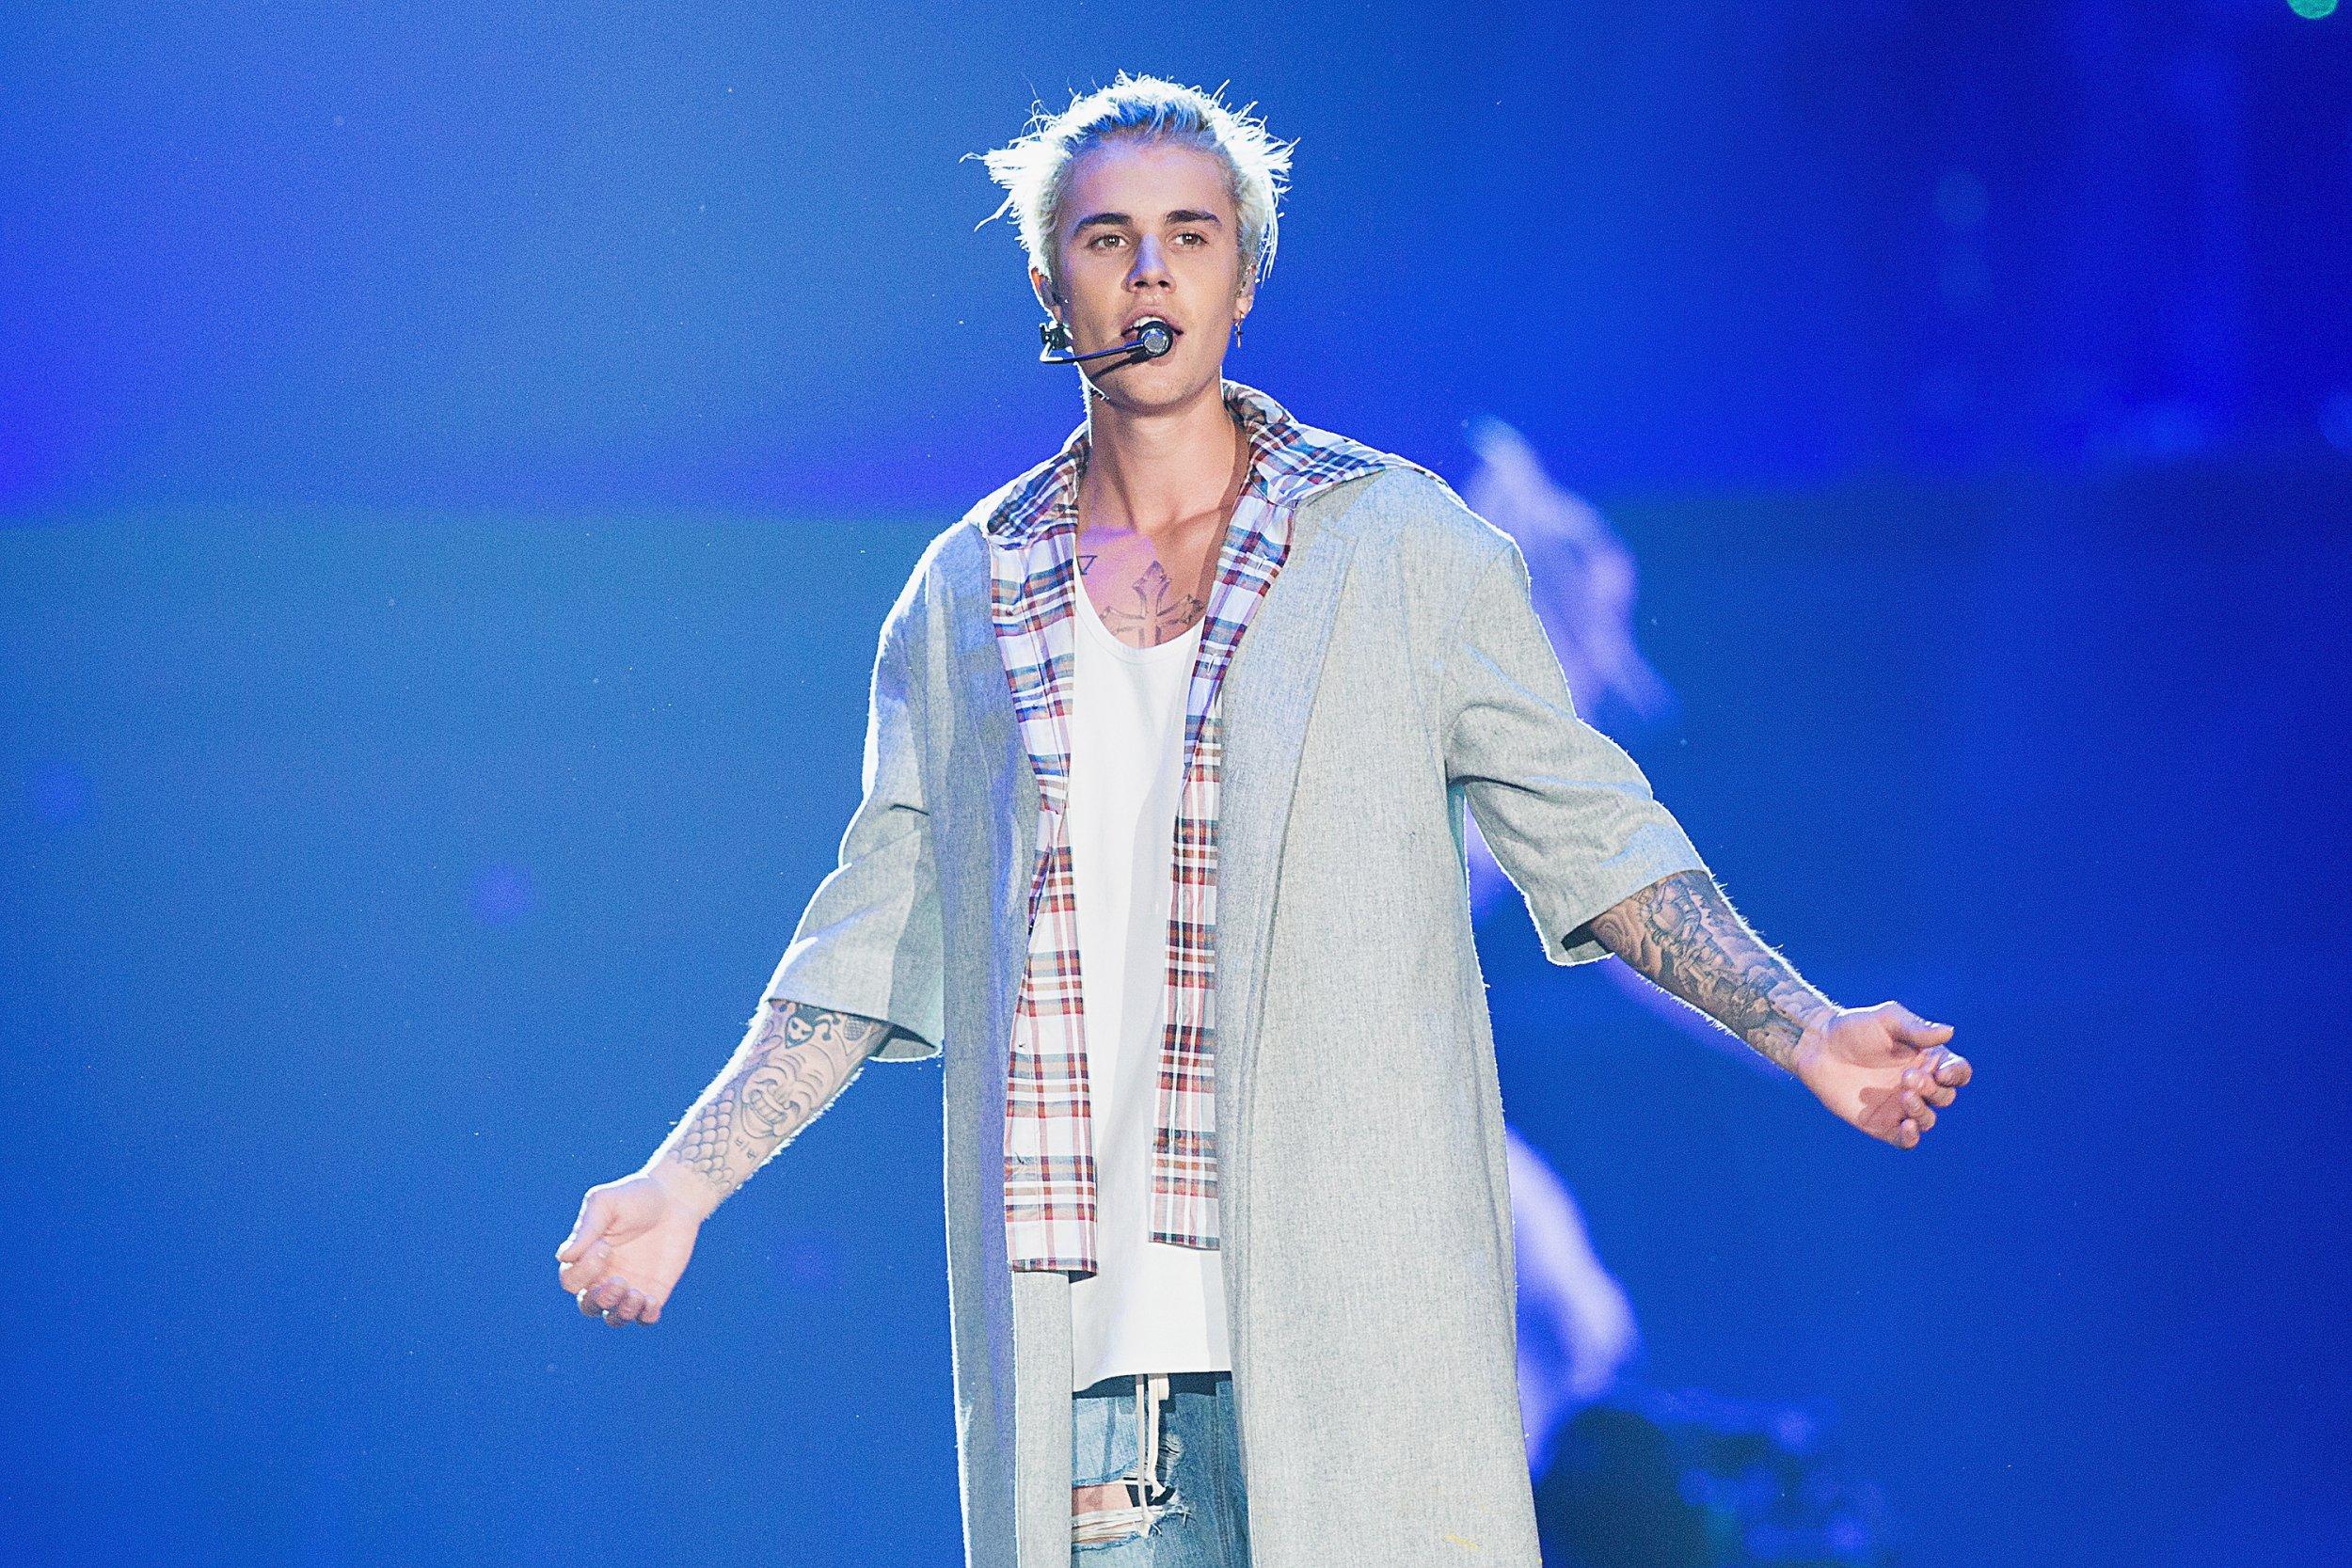 Justin Bieber on Purpose tour